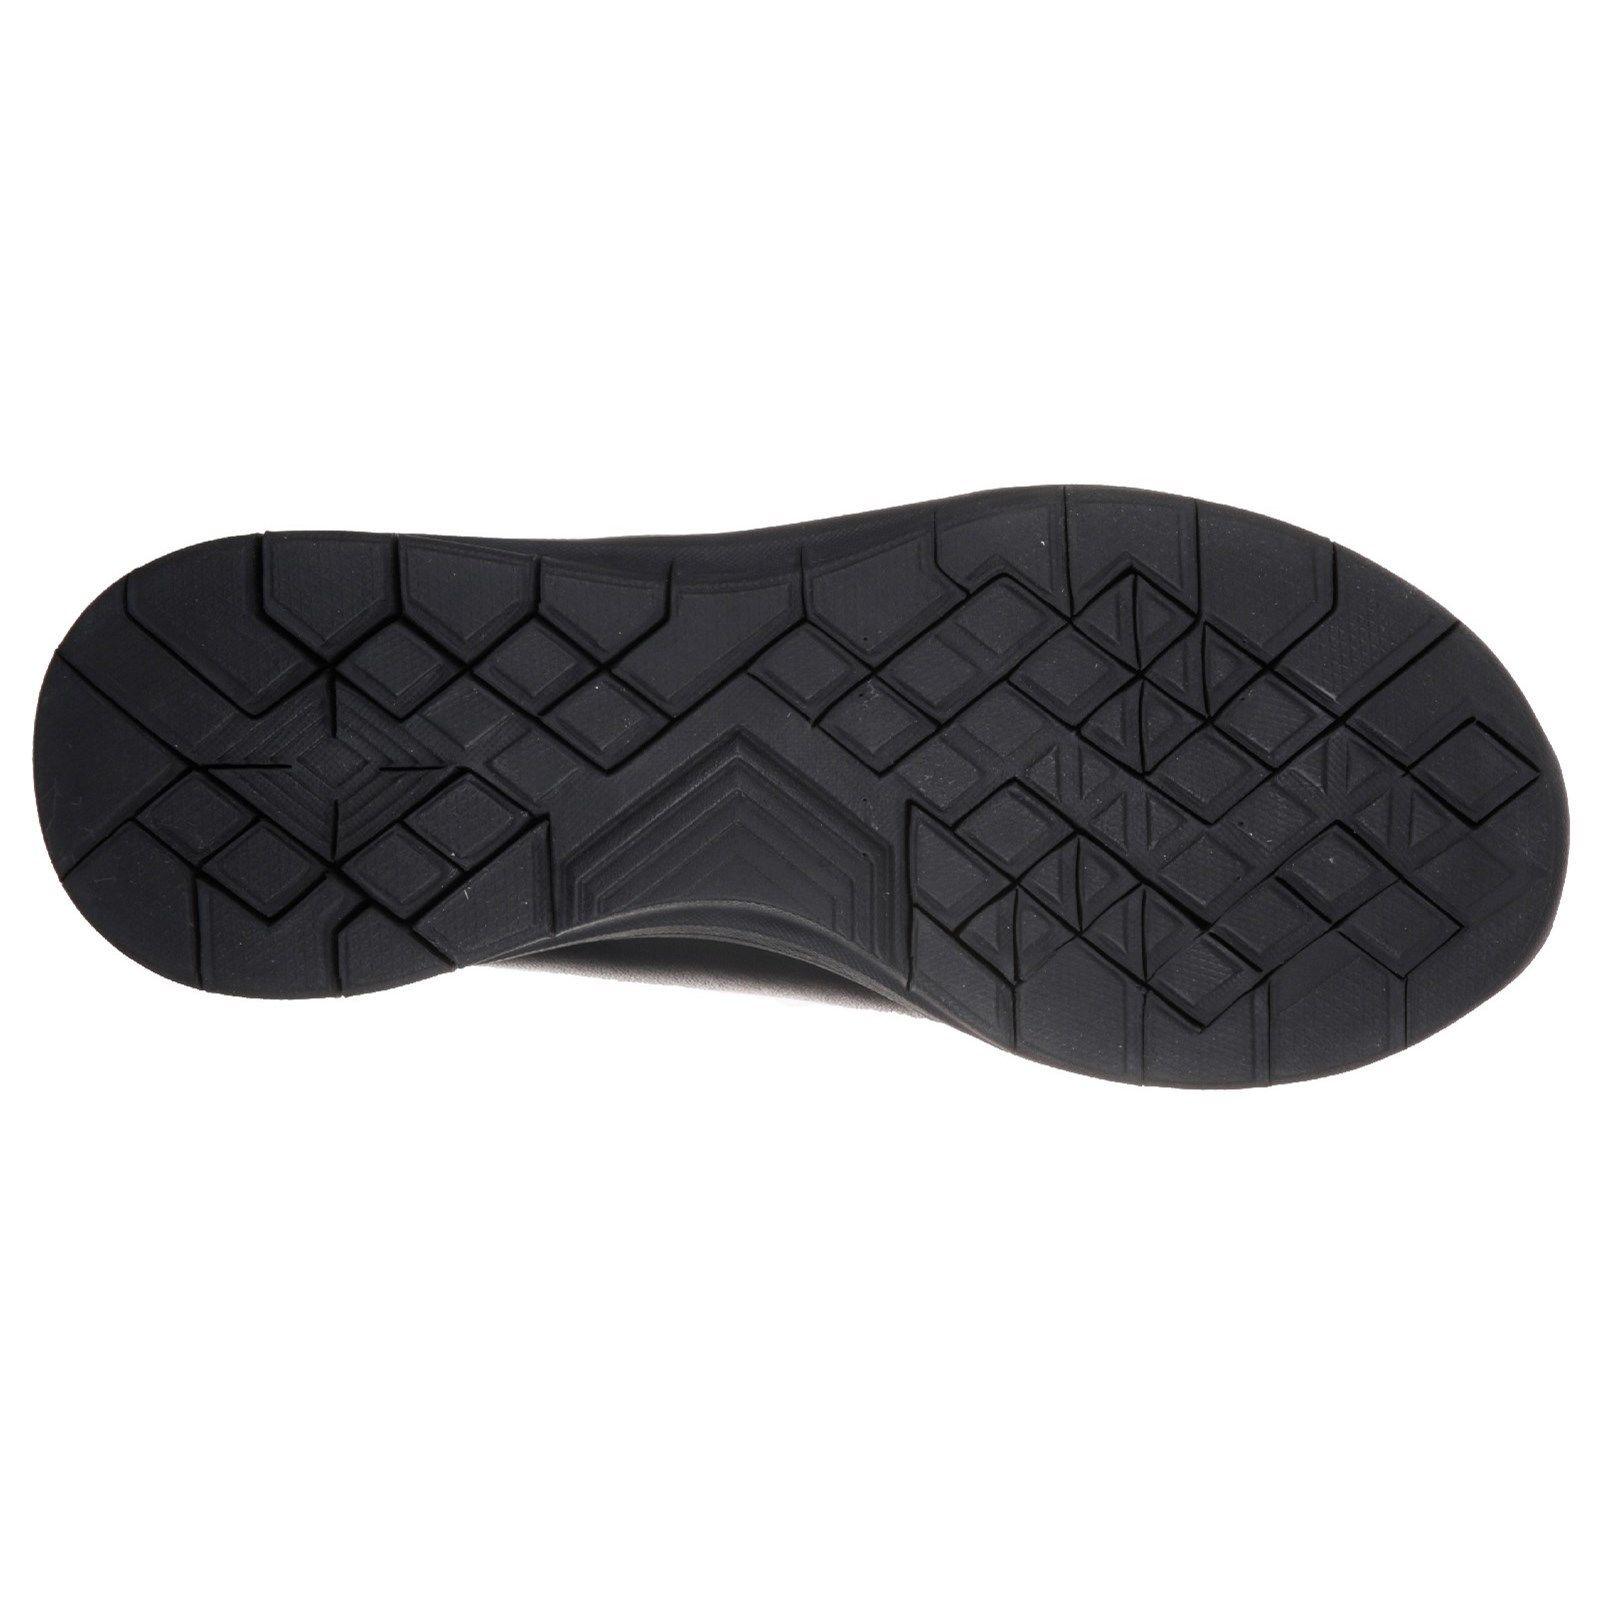 Skechers-Zapatillas-deportivas-Synergy-2-0-para-mujer-senora-FS4430 miniatura 7